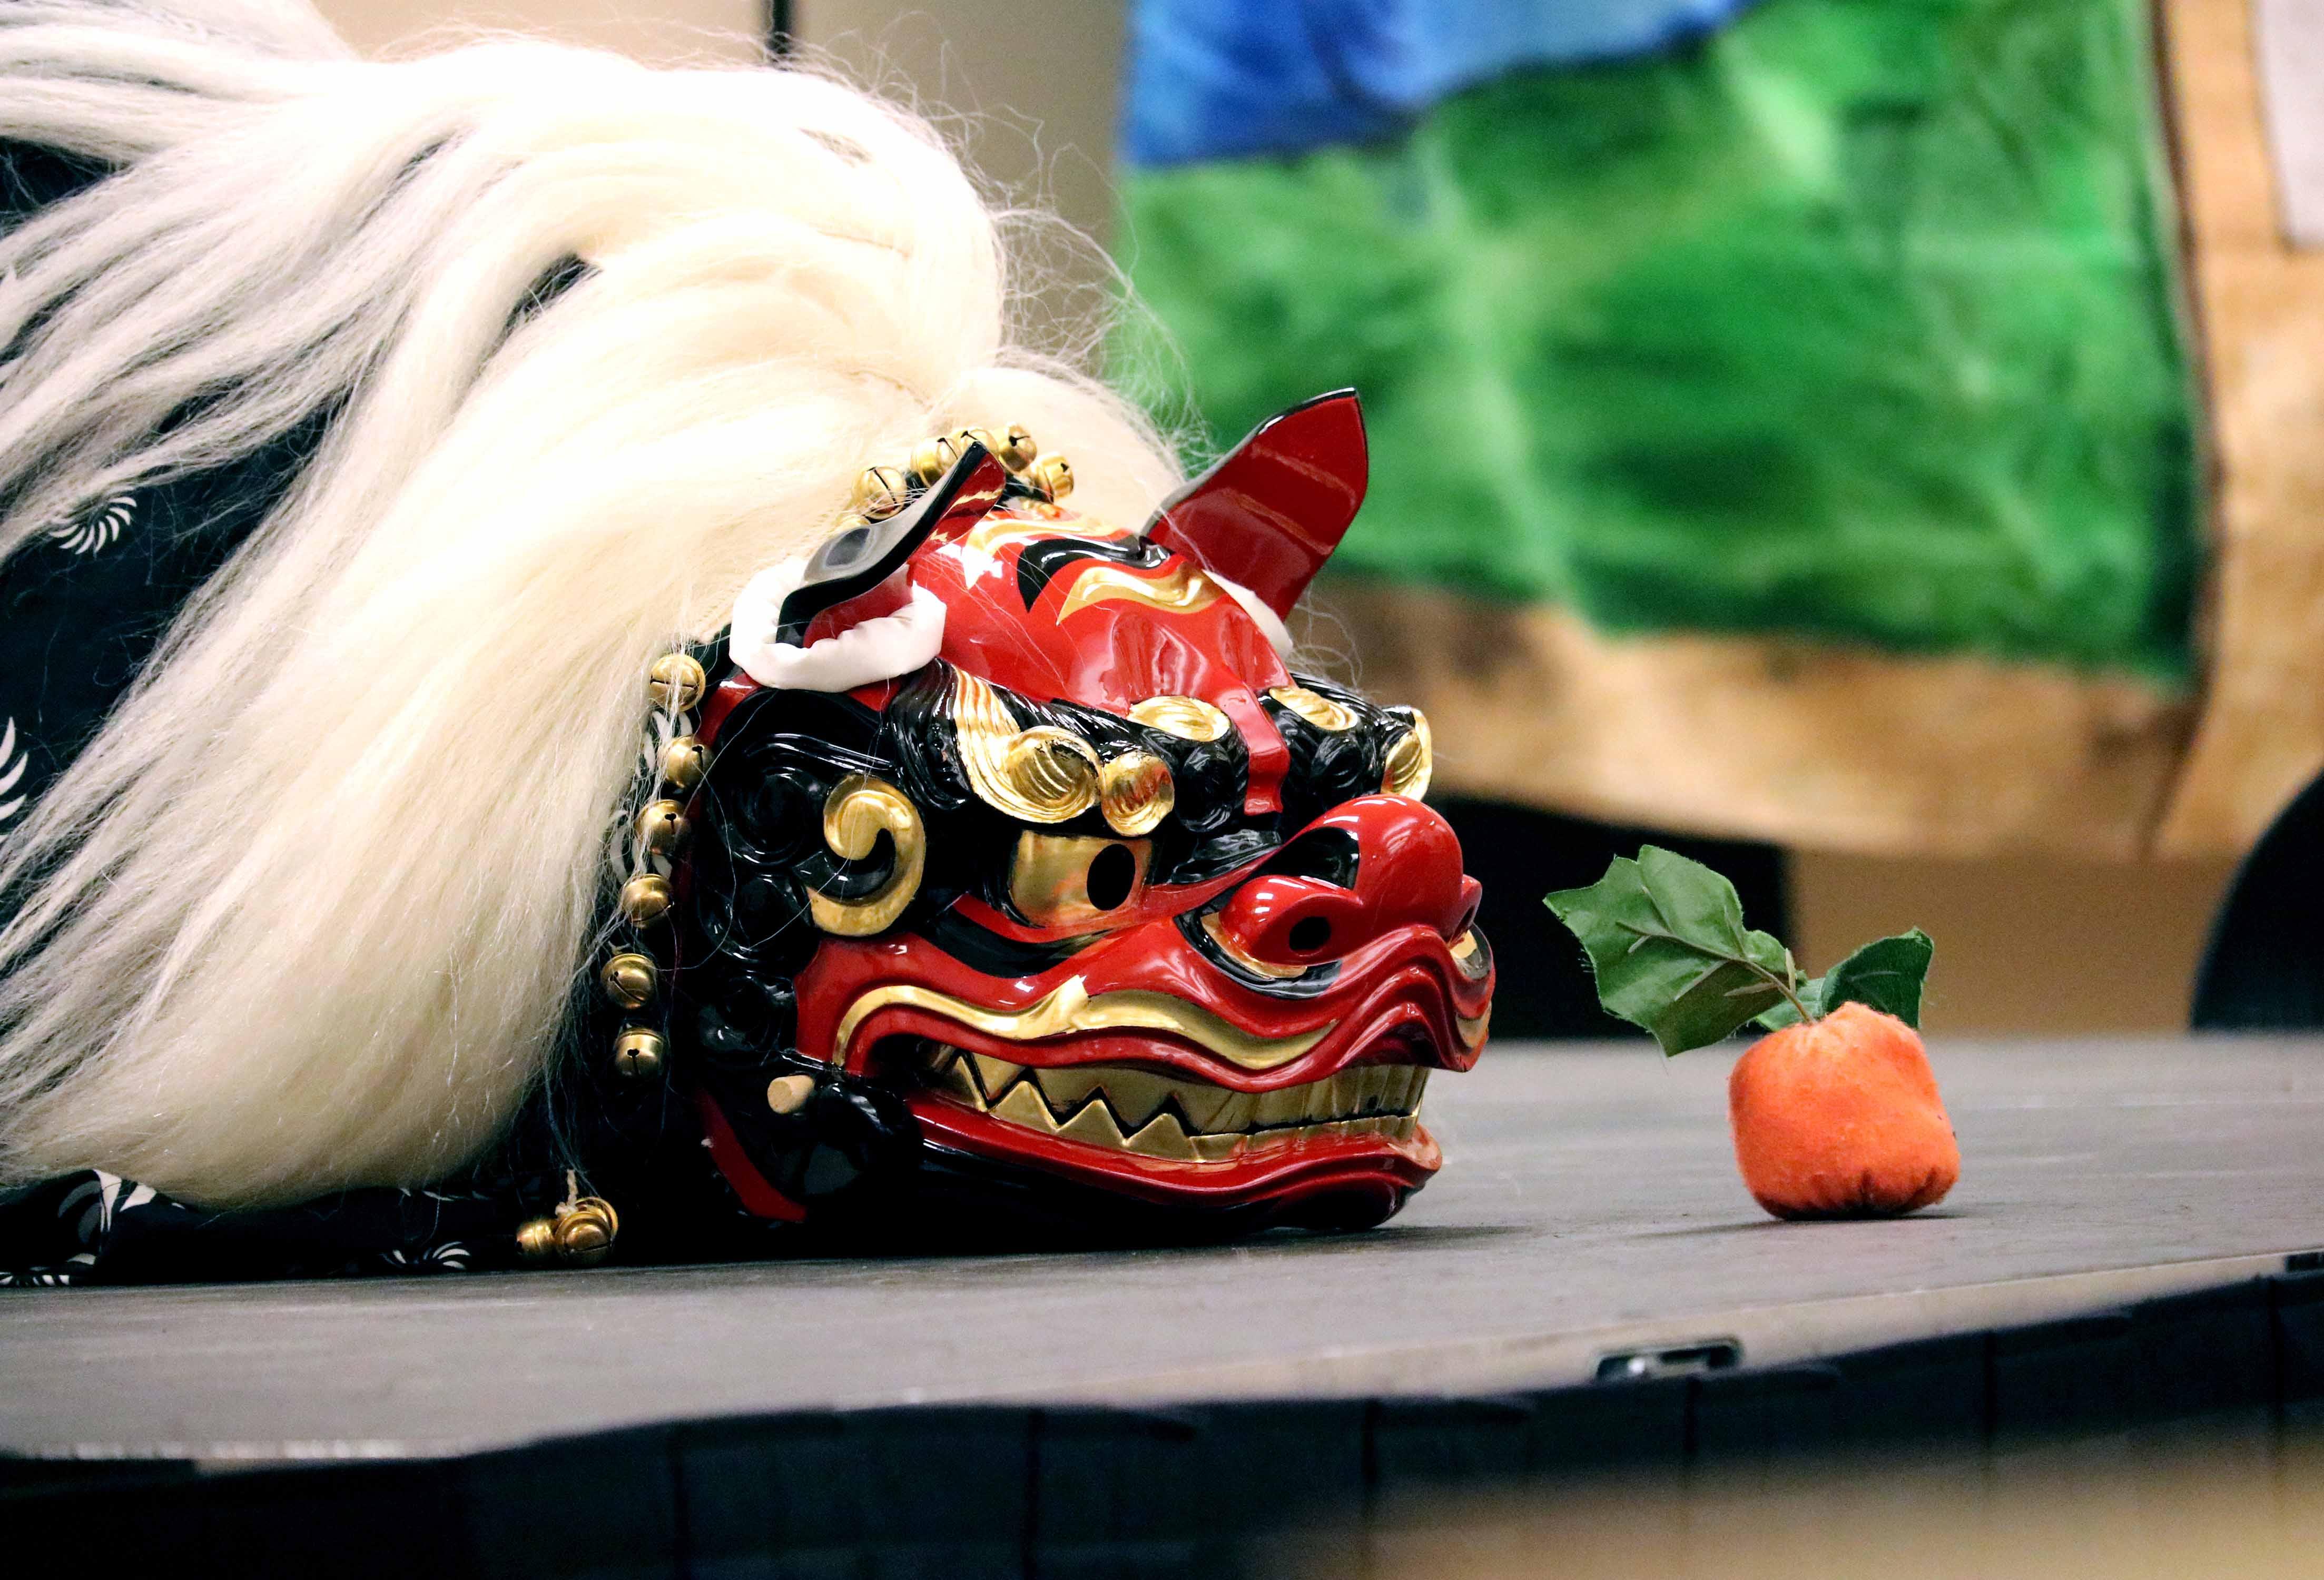 Mikoshi performance at the Missouri History Museum